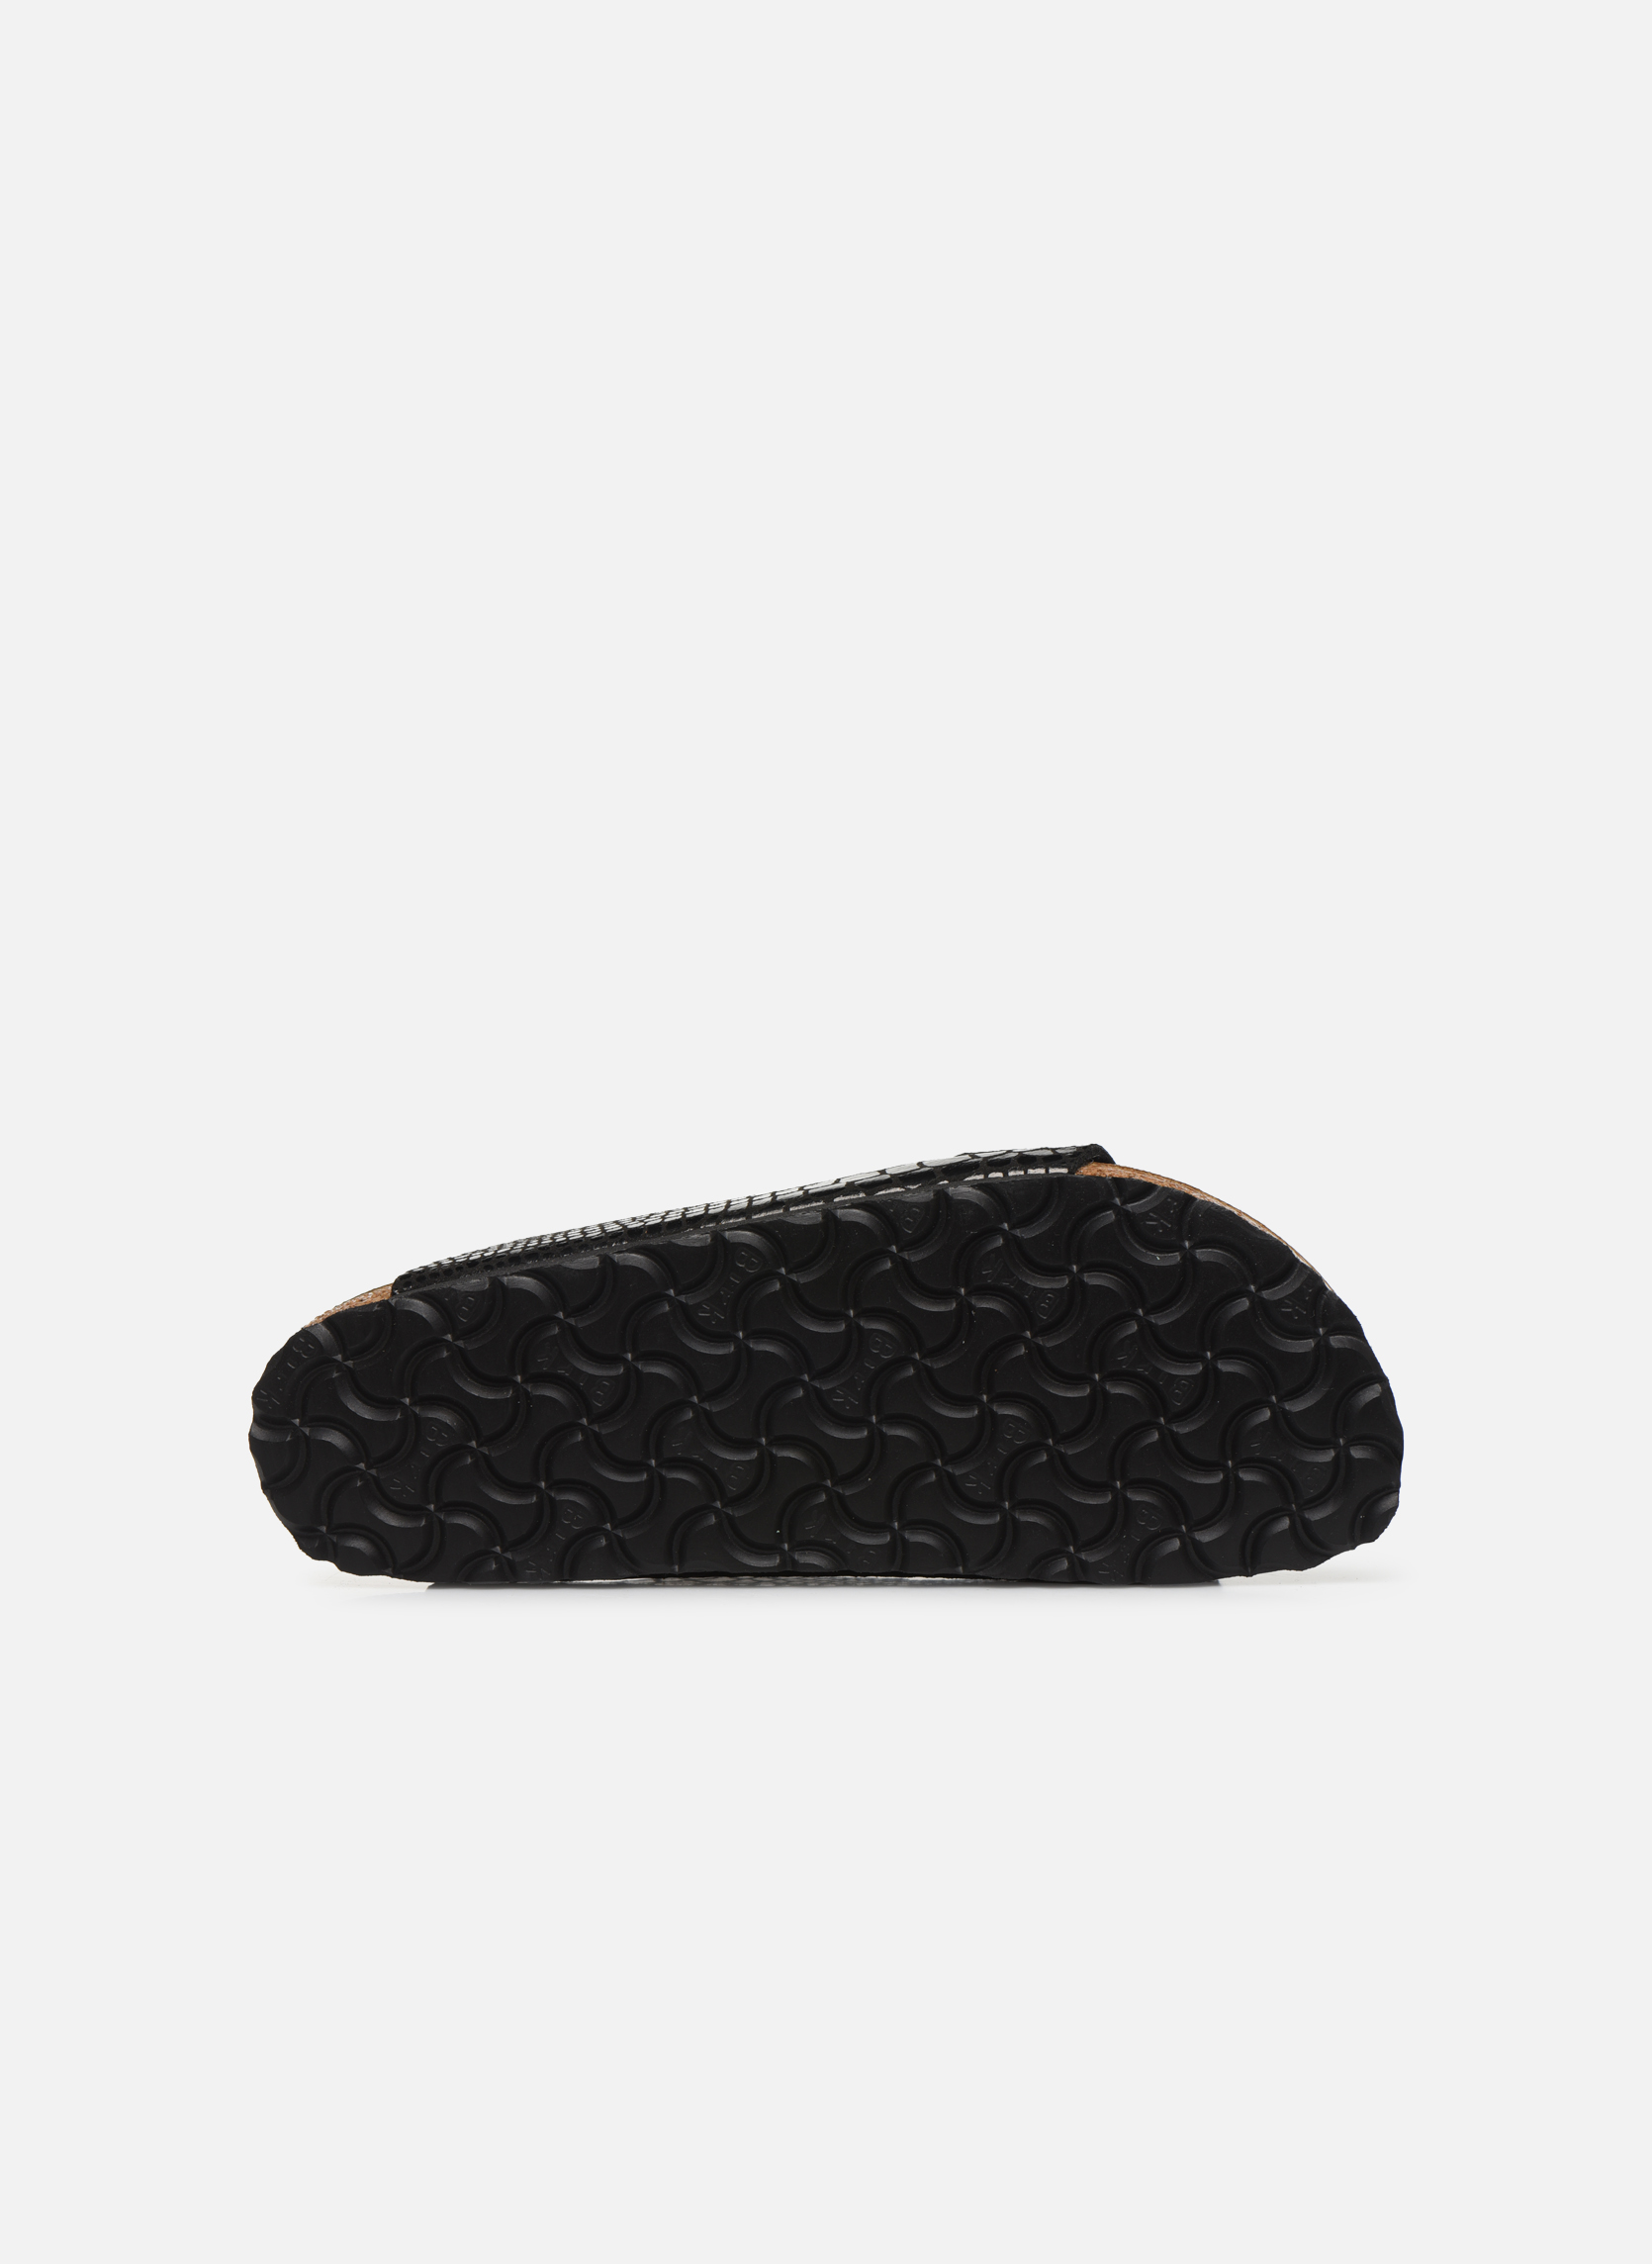 Arizona W (Smal model) Shiny Snake Black